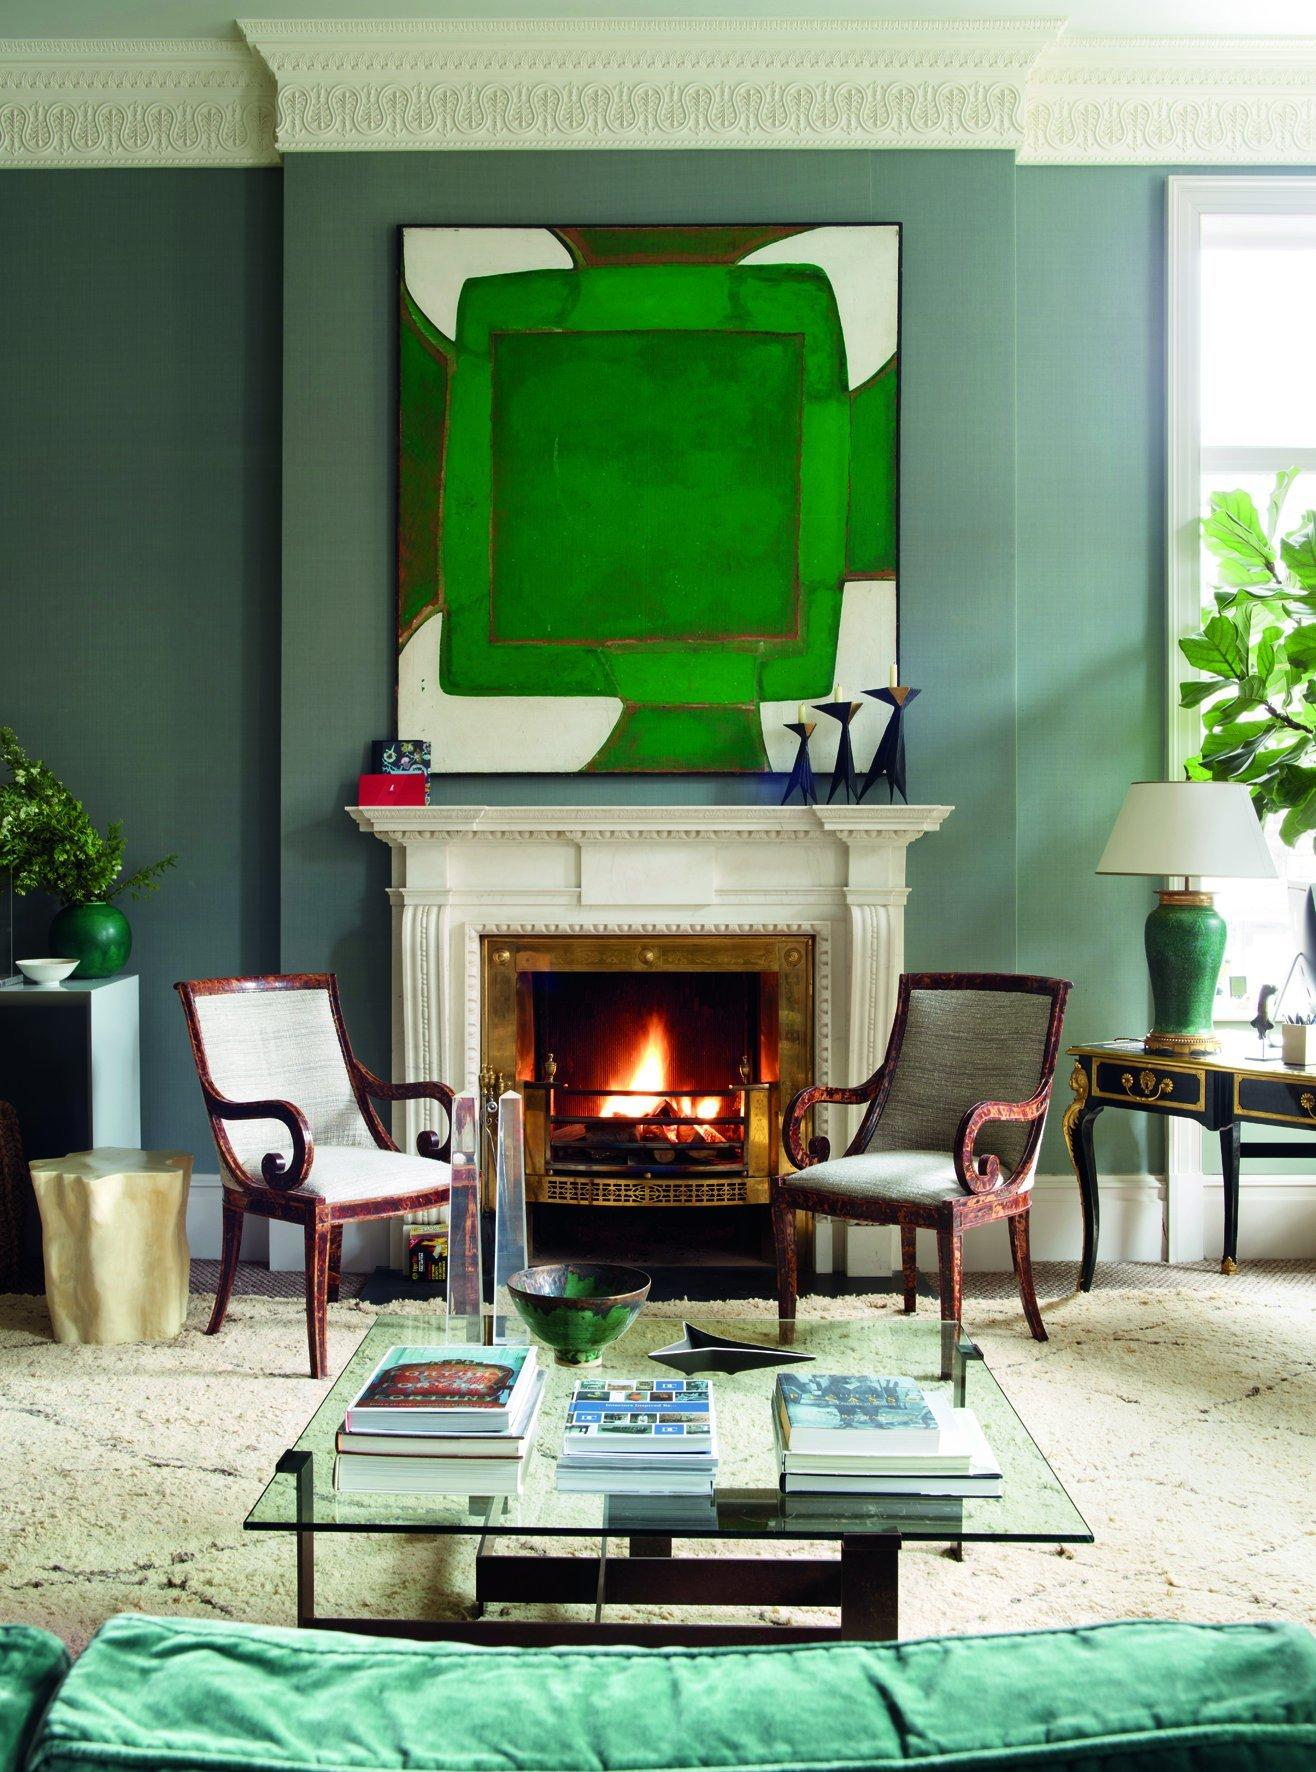 Interior Design Review: Volume 19: Andrew Martin: 9783832732714: Books -  Amazon.ca